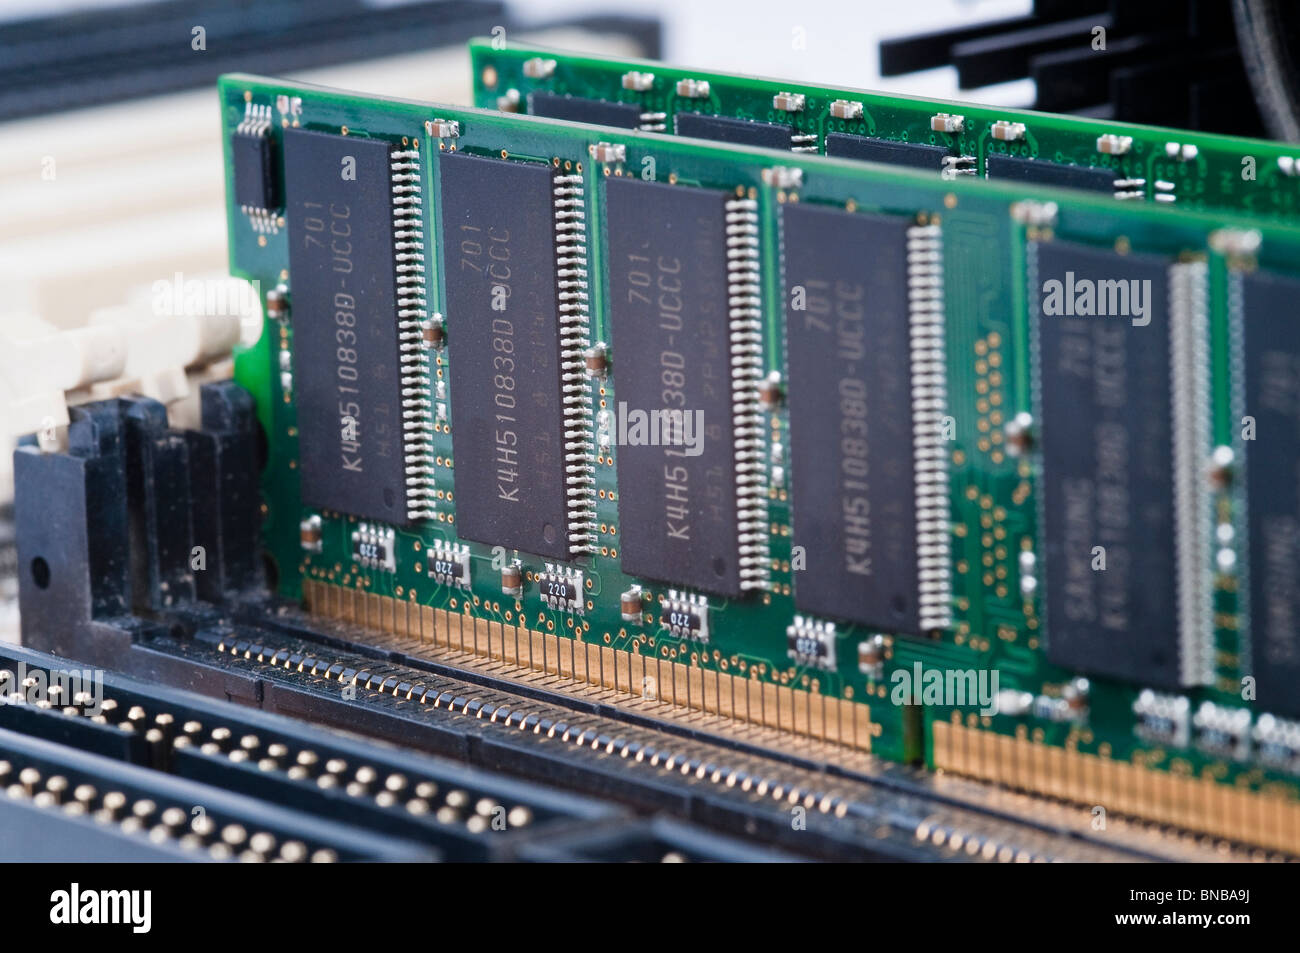 Macro, RAM memory in a personal computer, PC - Stock Image